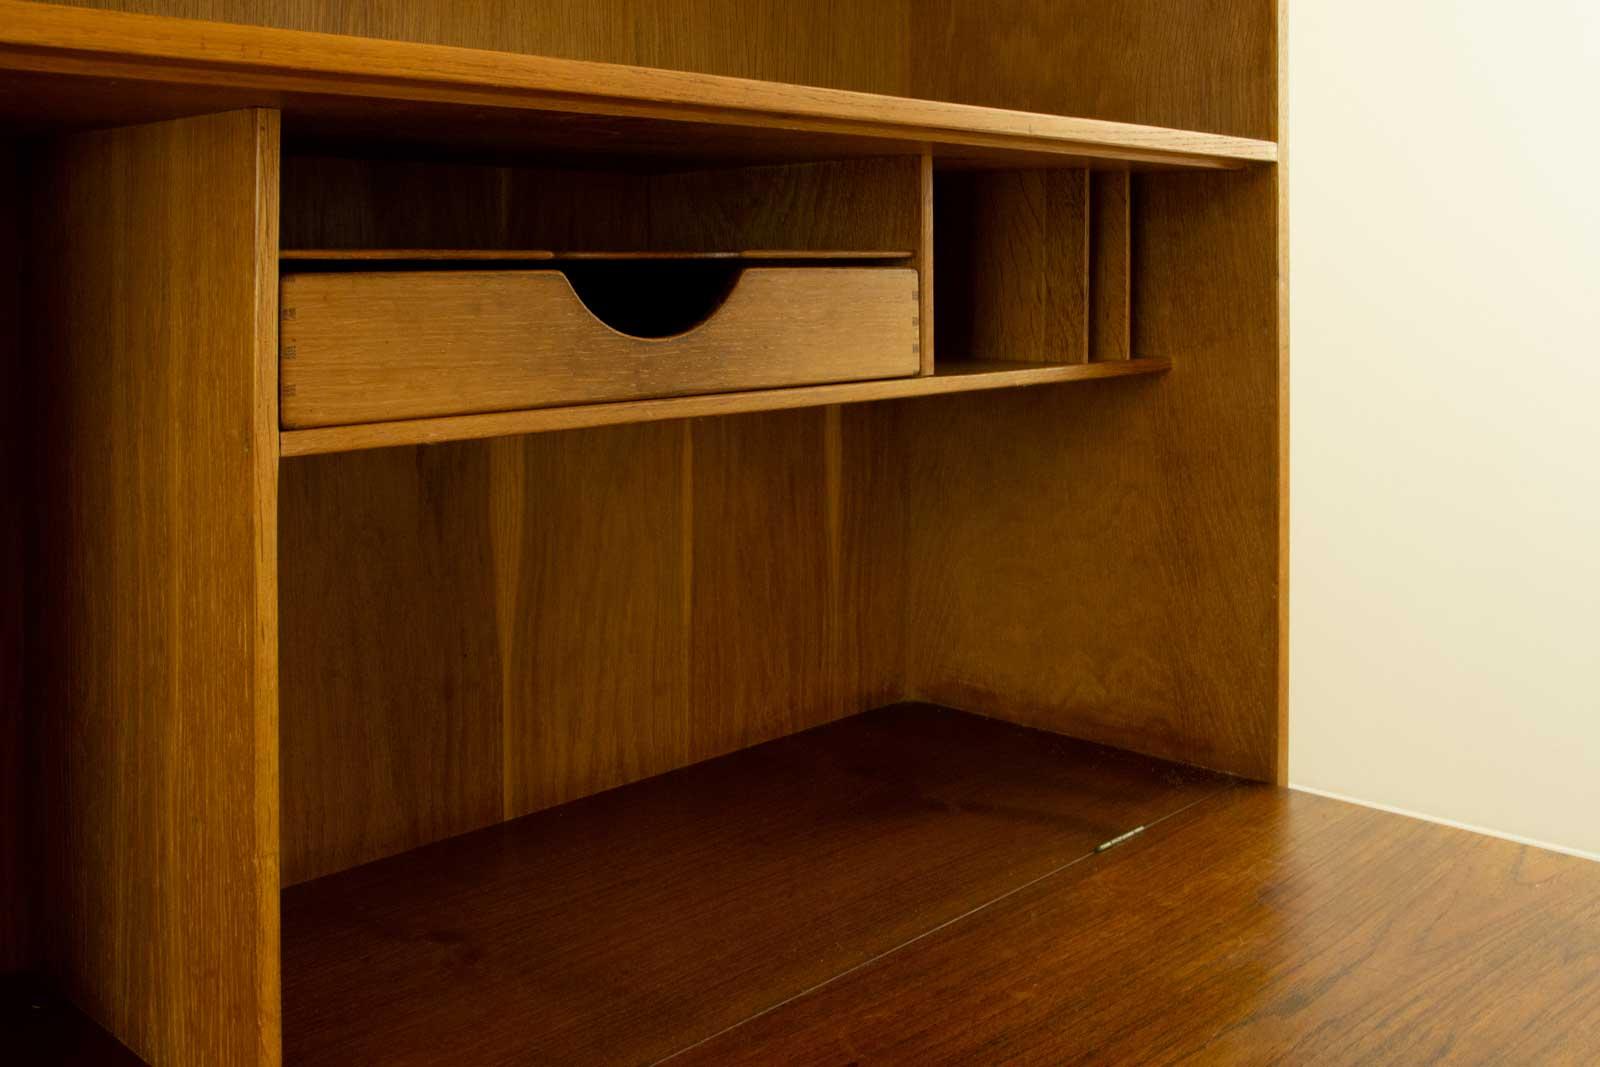 RY Writing Cabinet by Hans J Wegner